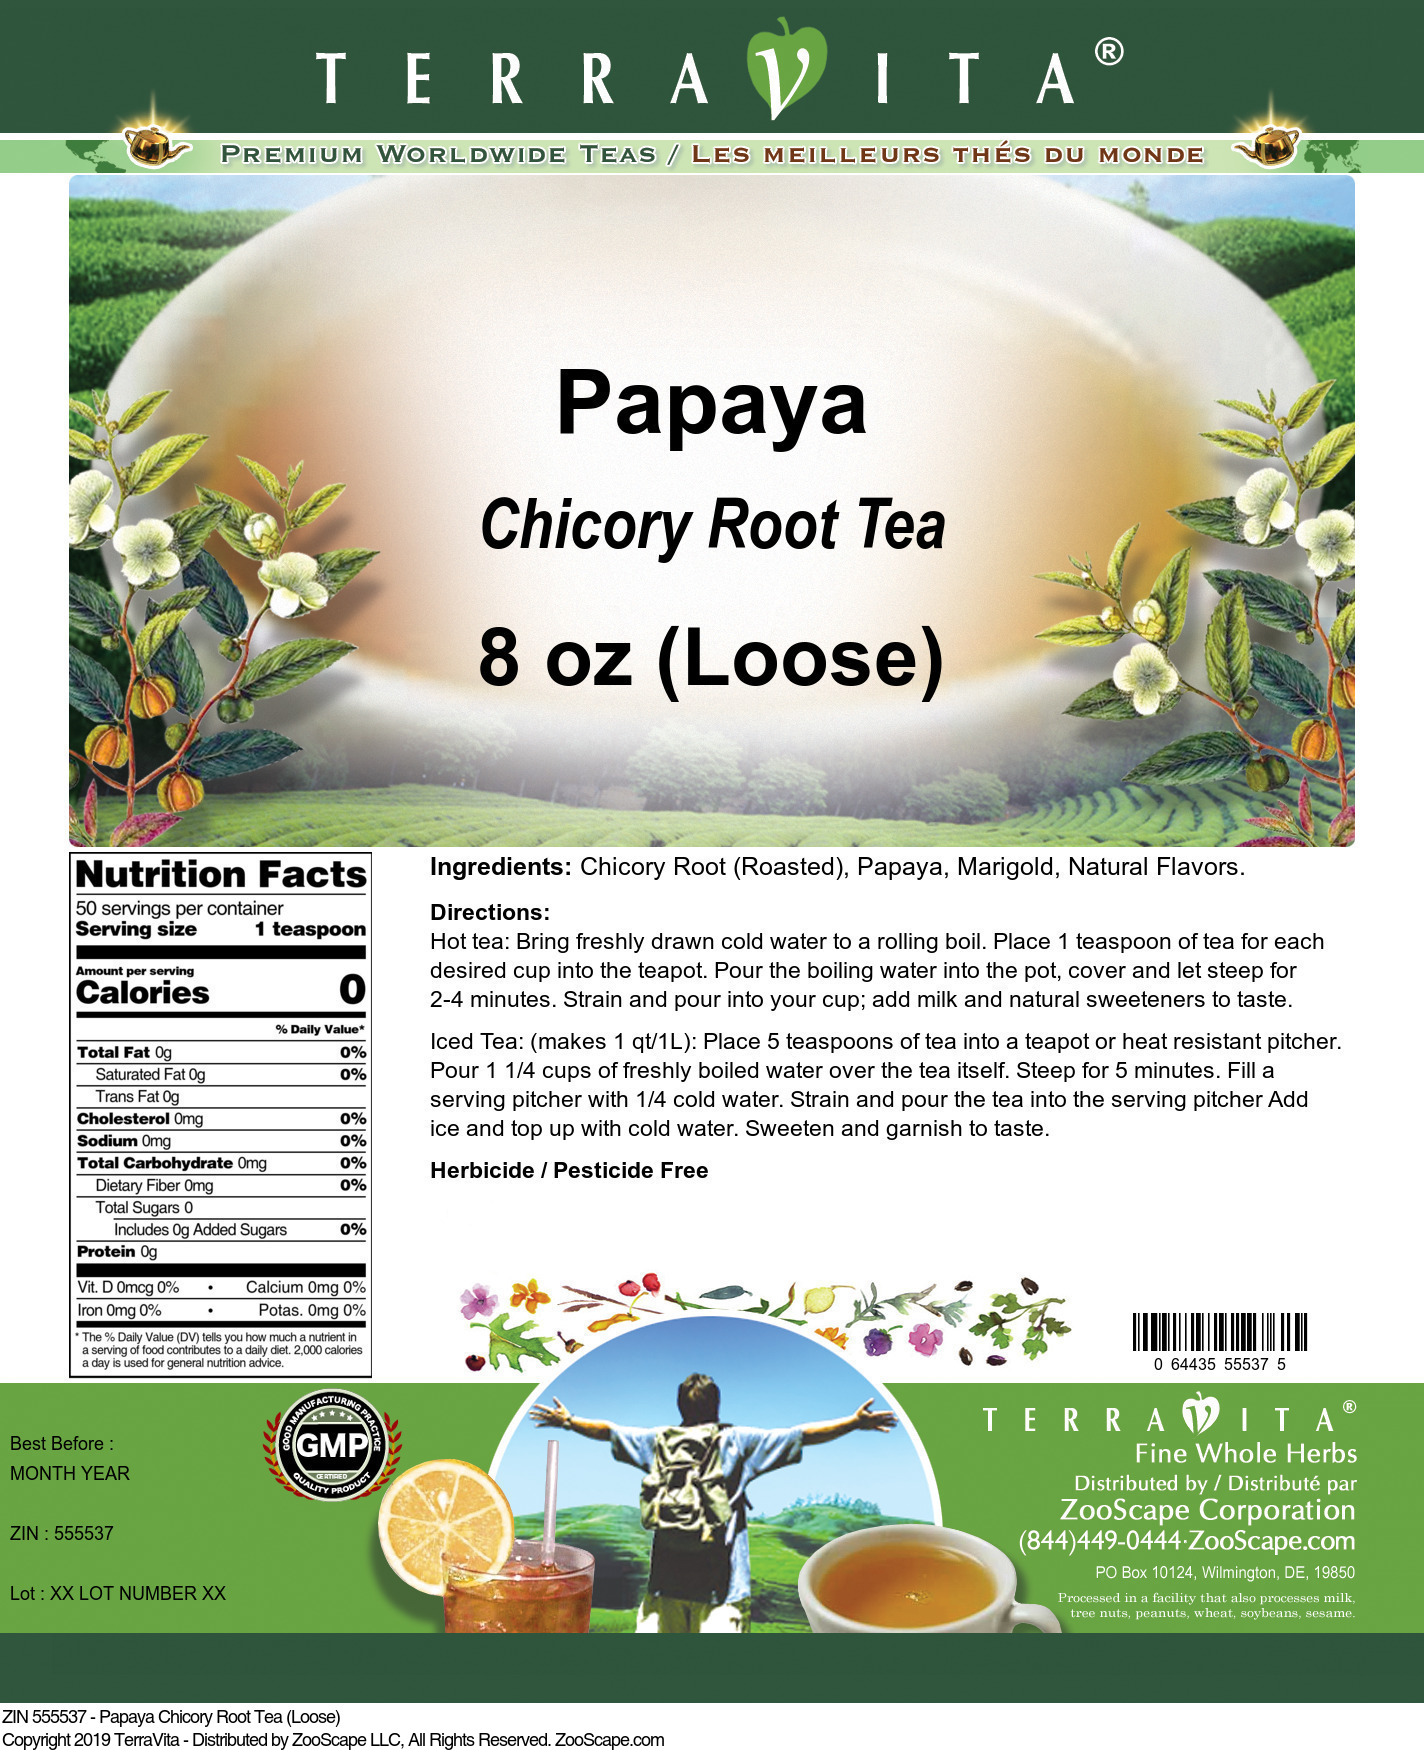 Papaya Chicory Root